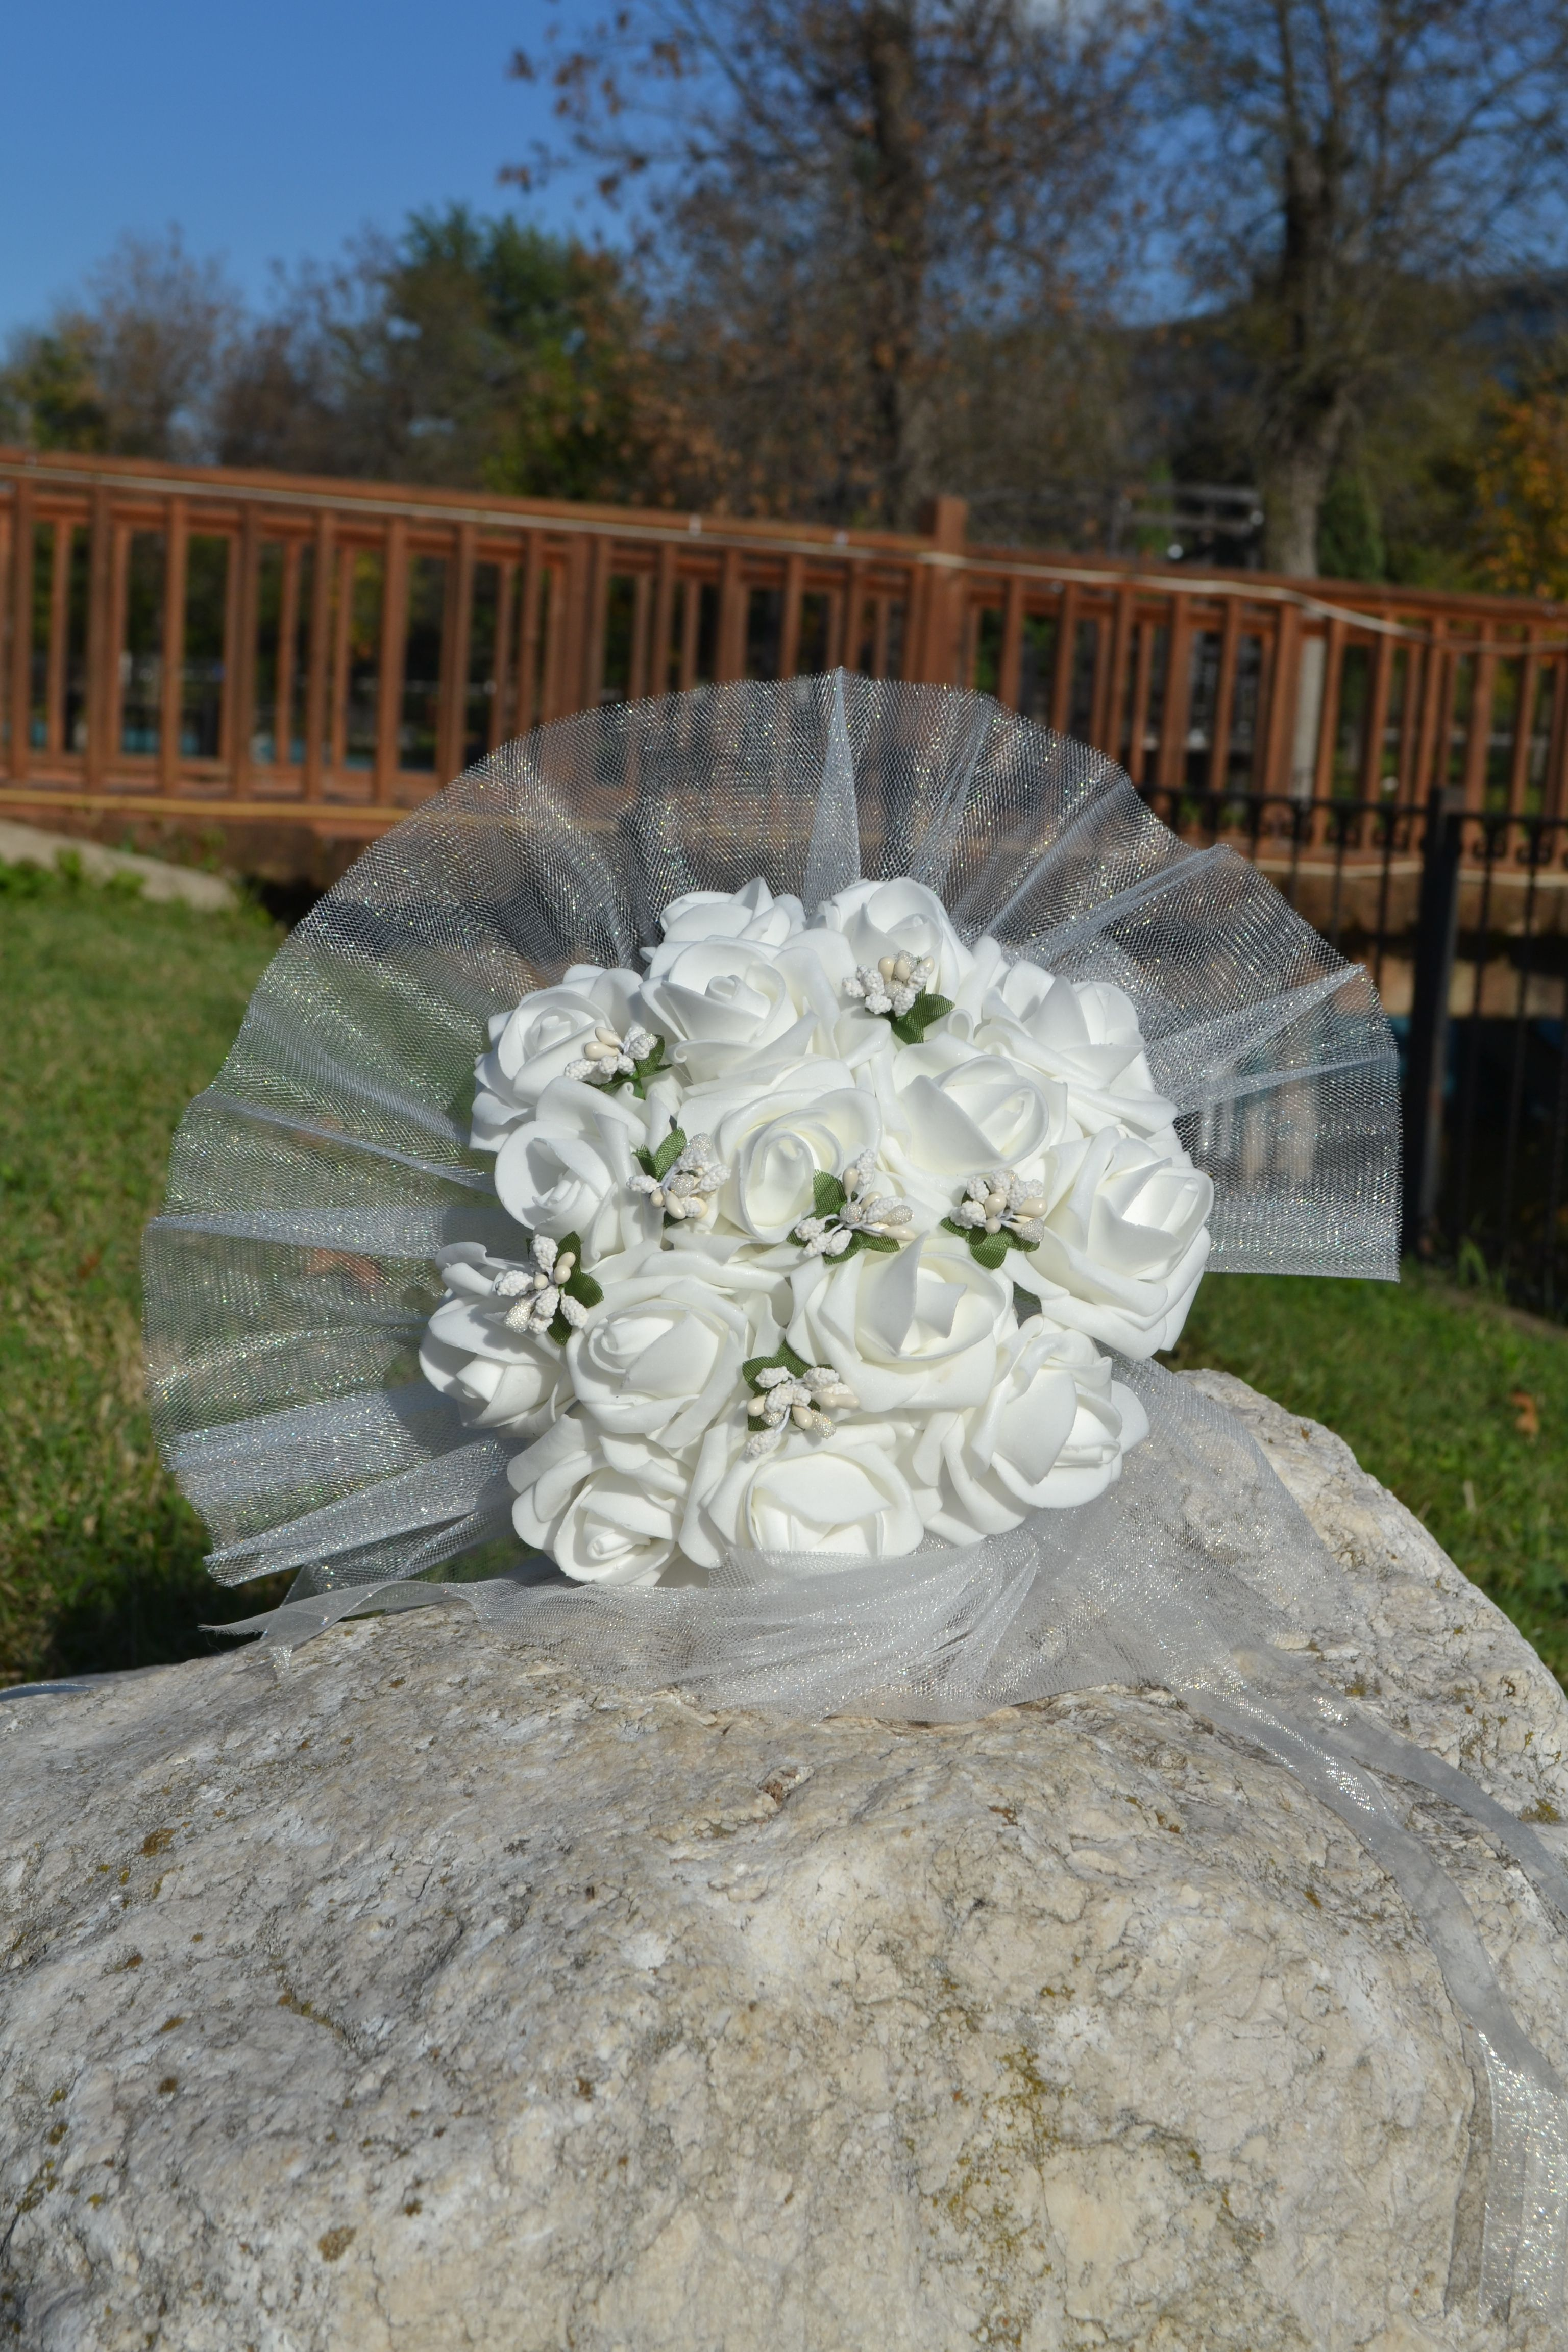 Wedding decorations ghana  whide bride bouquethandmade wedding bride bouquet  bride bouquet